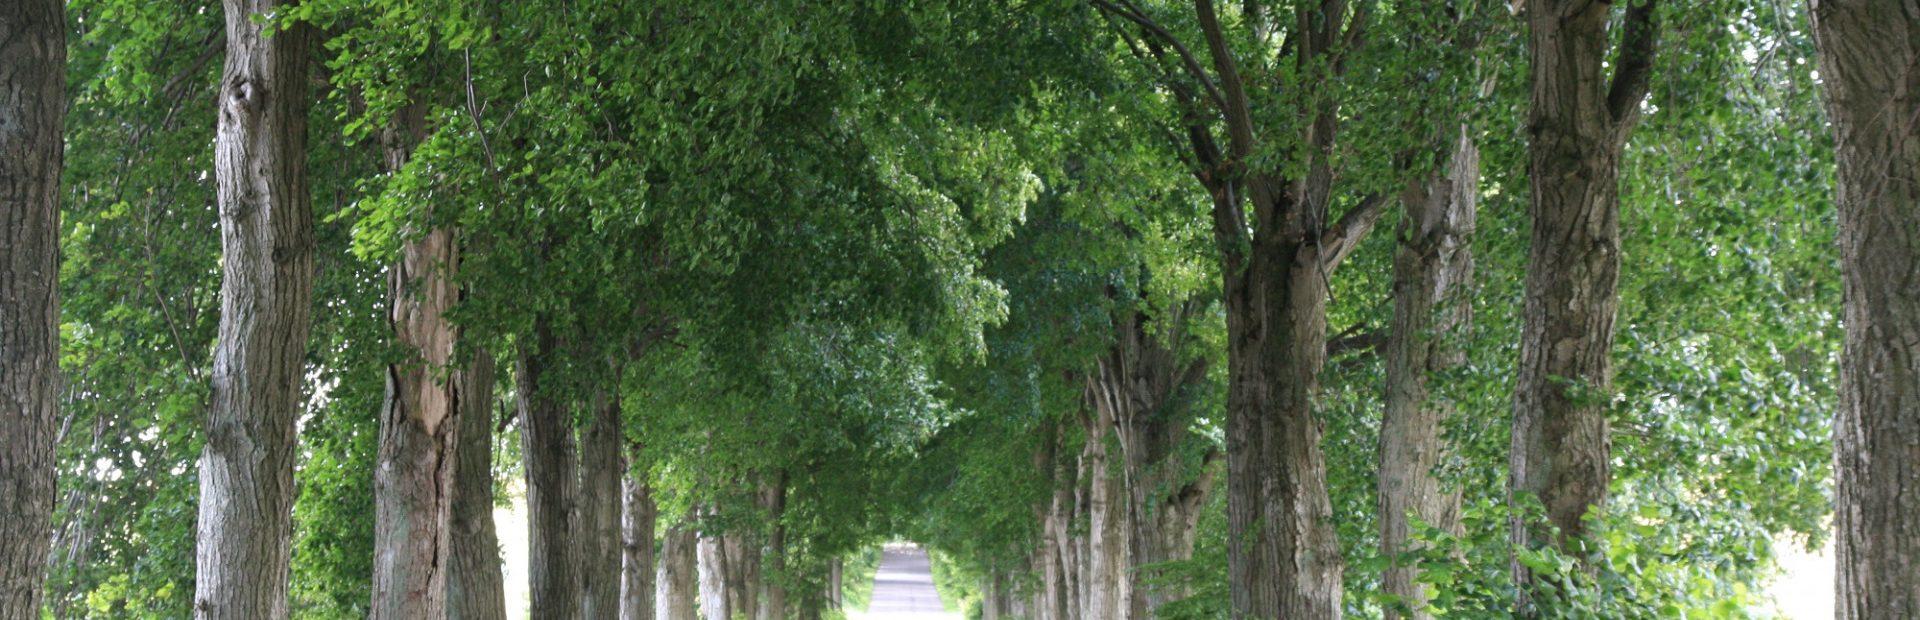 Park Krajobrazowy Dolina Słupi – nature trails